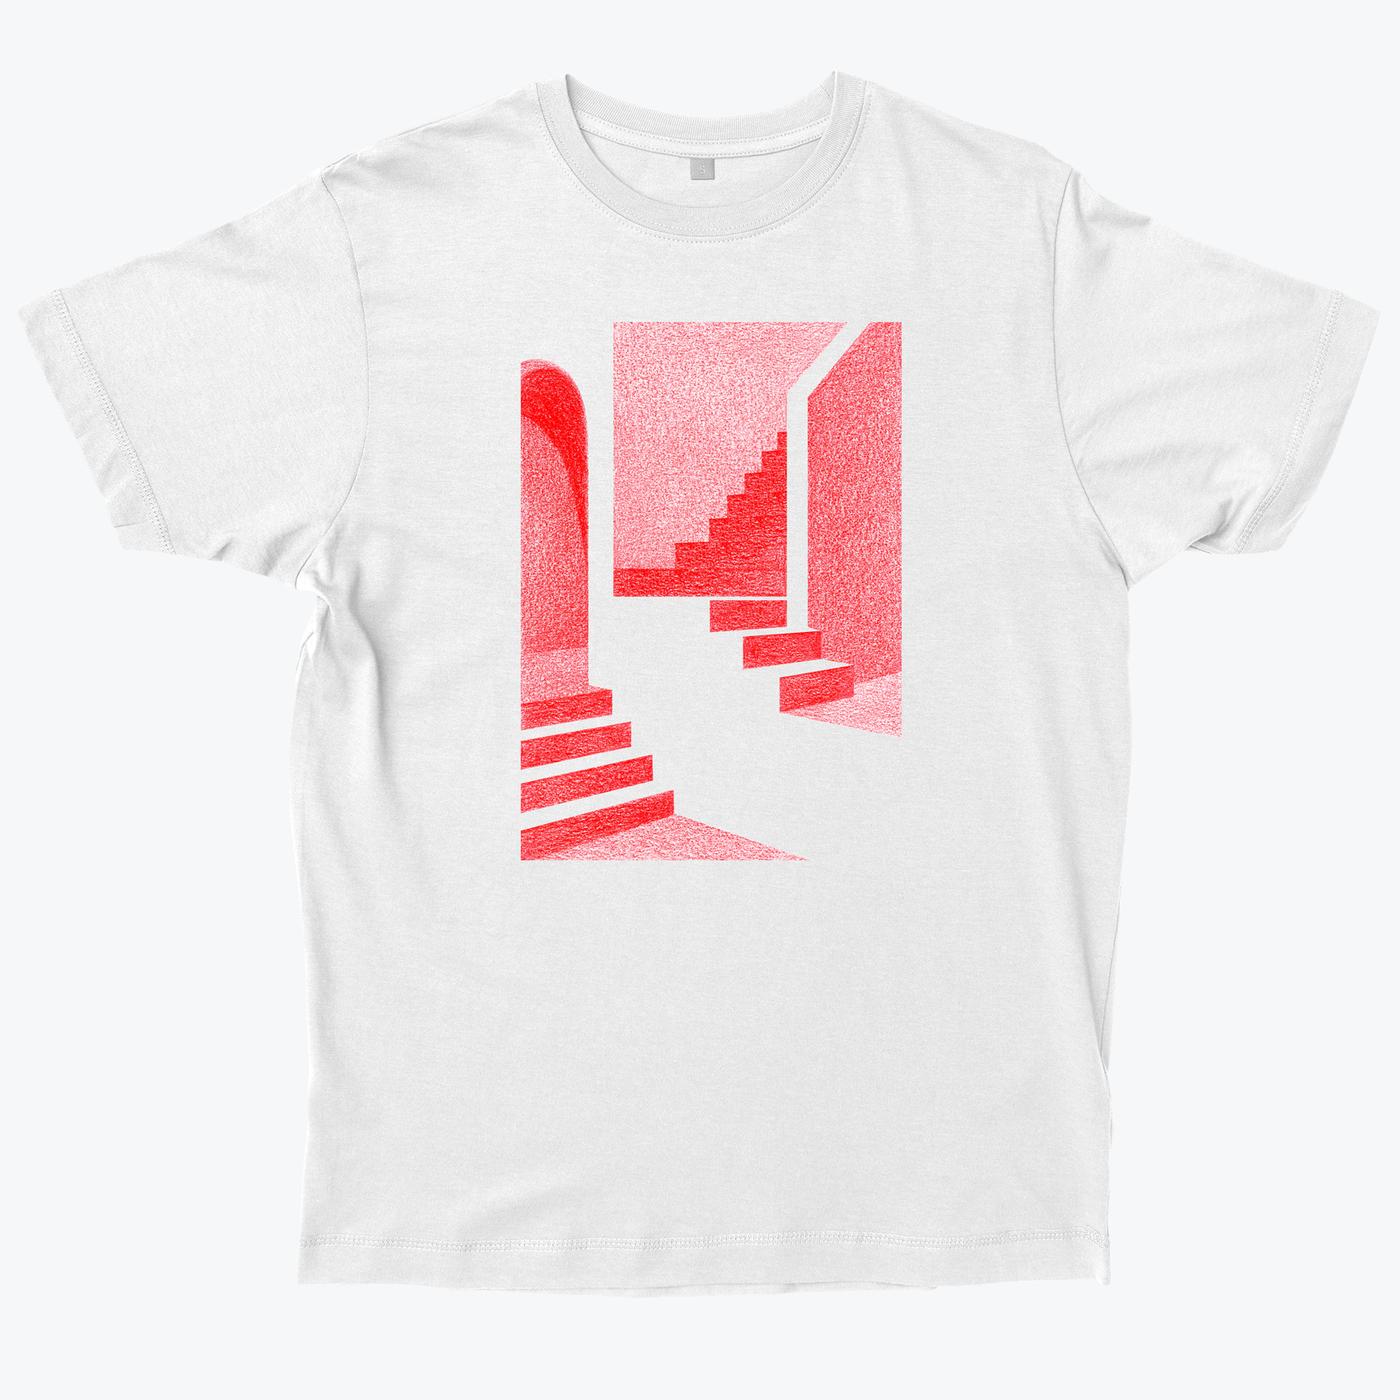 Aistė Stancikaitė 'House In Tarumi' T-shirt